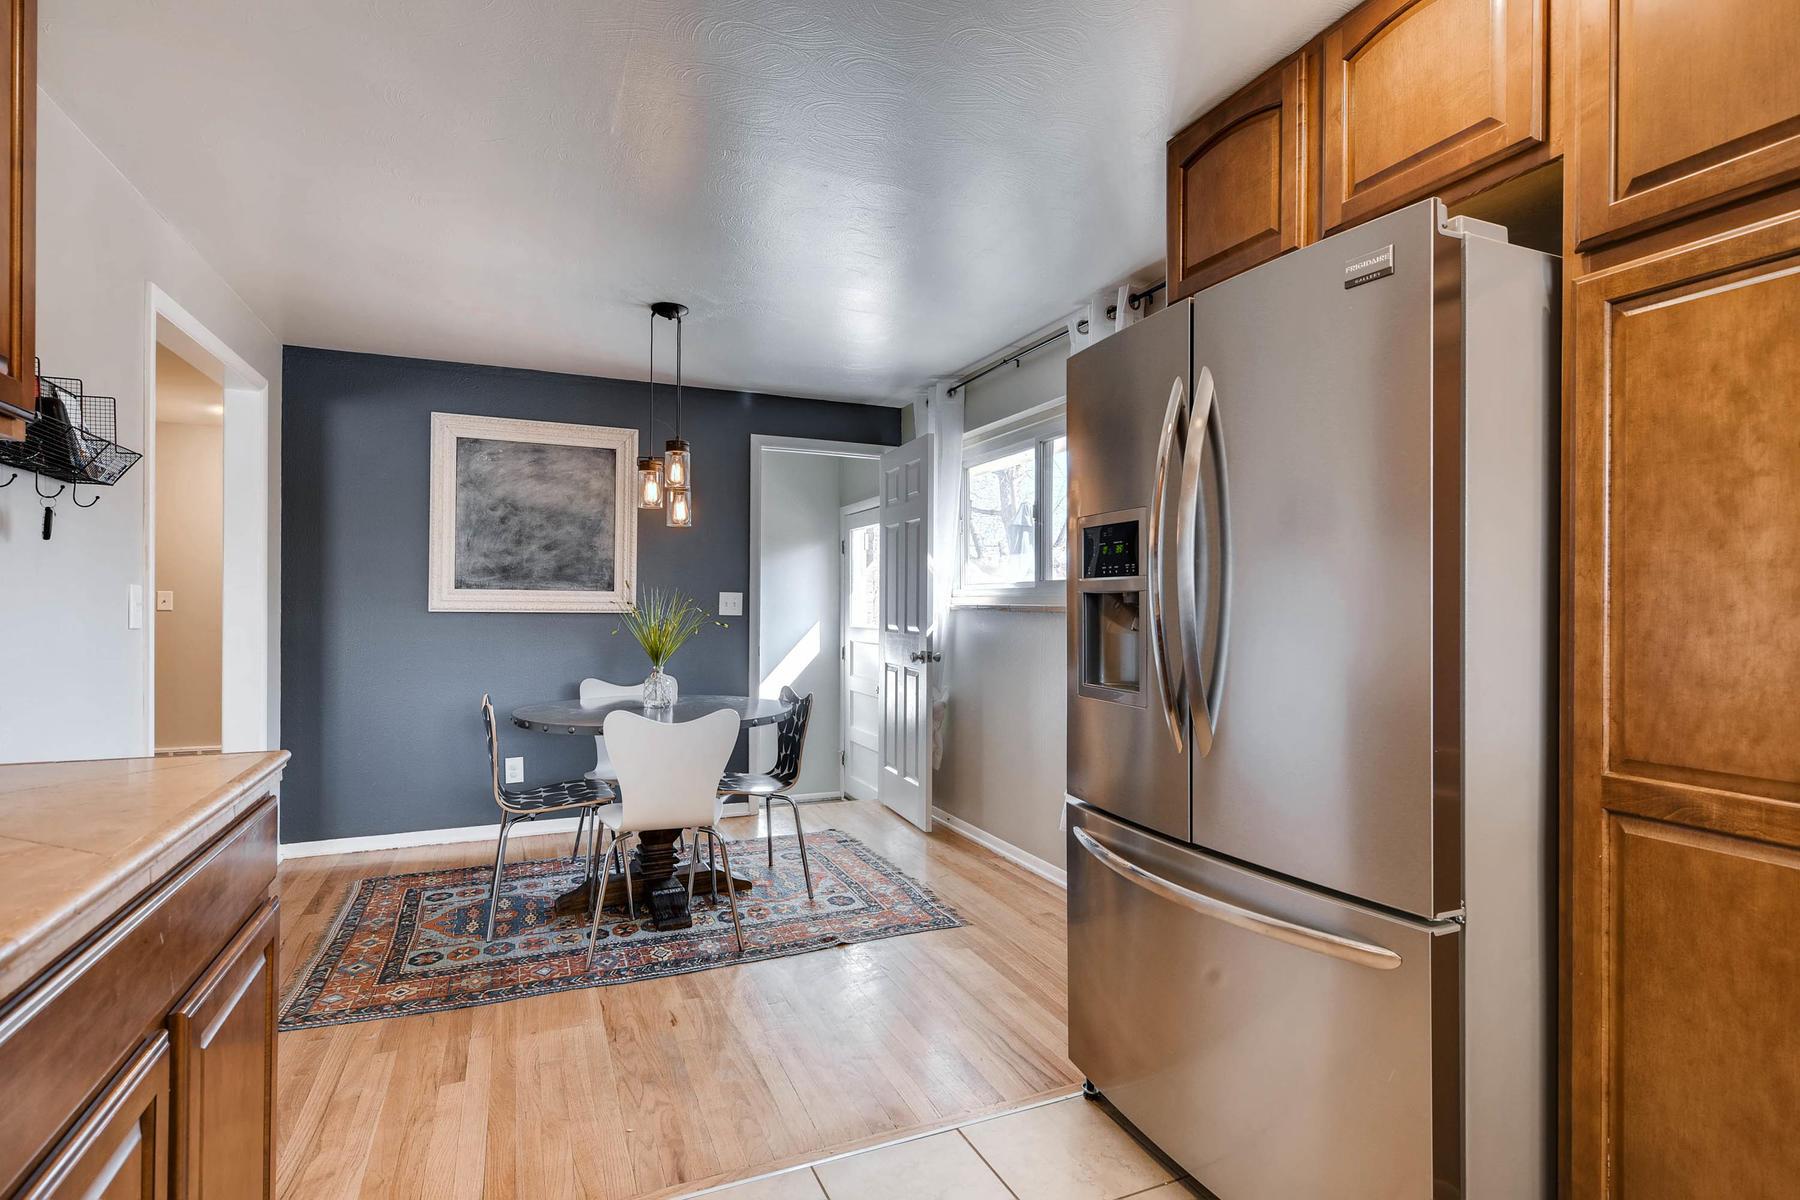 6676 S Kit Carson St-MLS_Size-010-6-Kitchen-1800x1200-72dpi.jpg